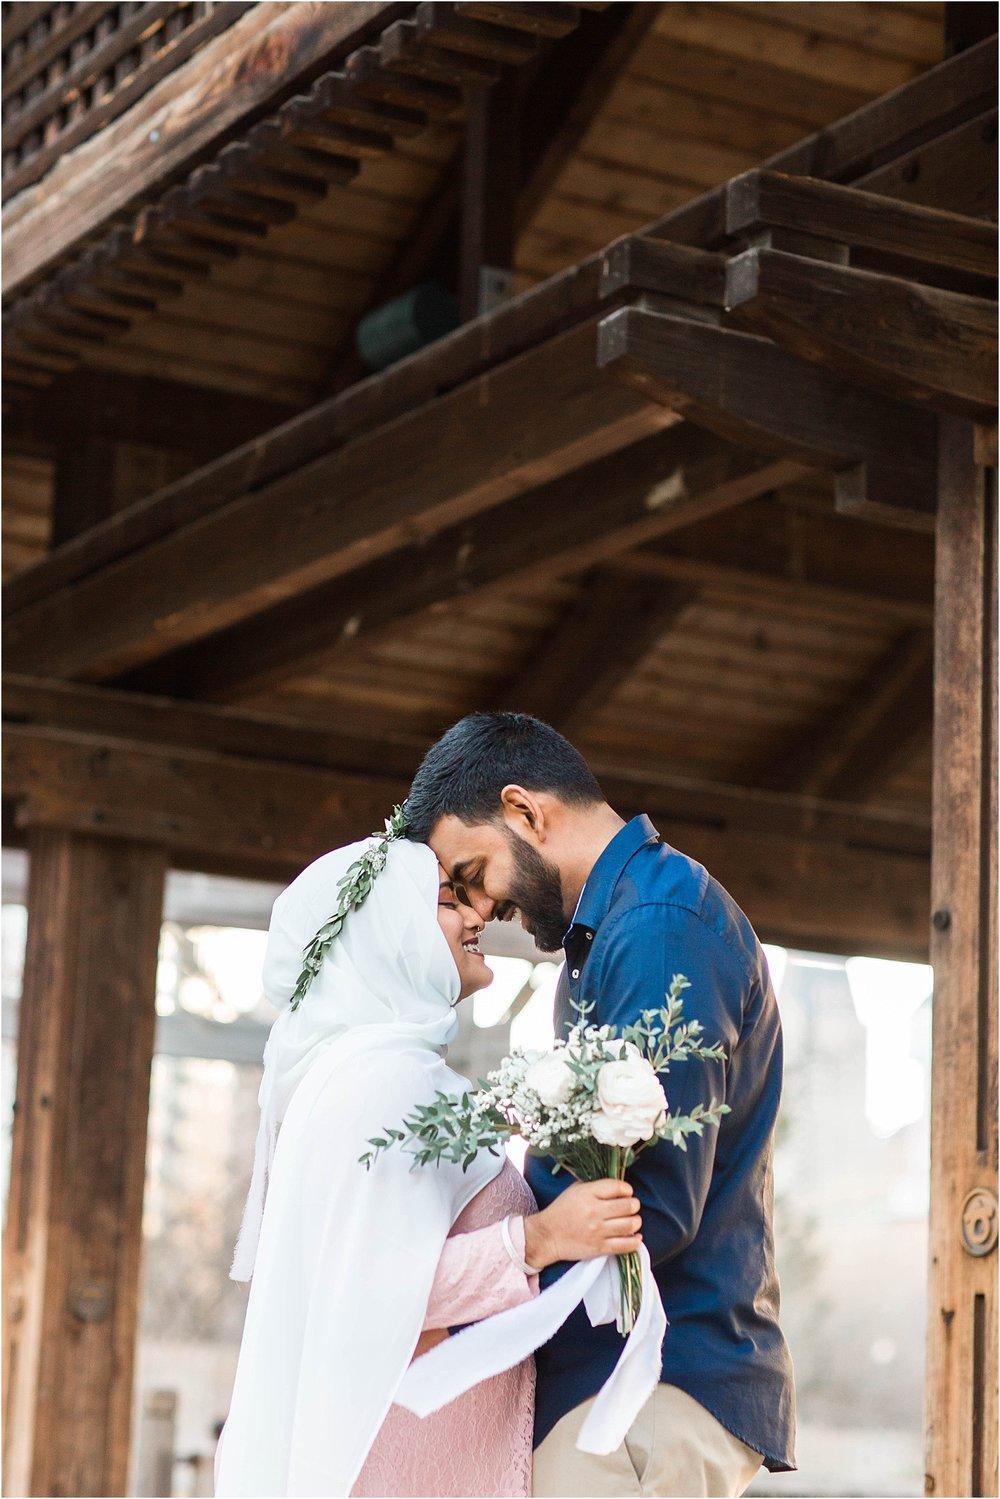 Kariya-Park-Anniversary-Session-Toronto-Mississauga-Brampton-Scarborough-GTA-Pakistani-Indian-Wedding-Engagement-Photographer-Photography_0048.jpg